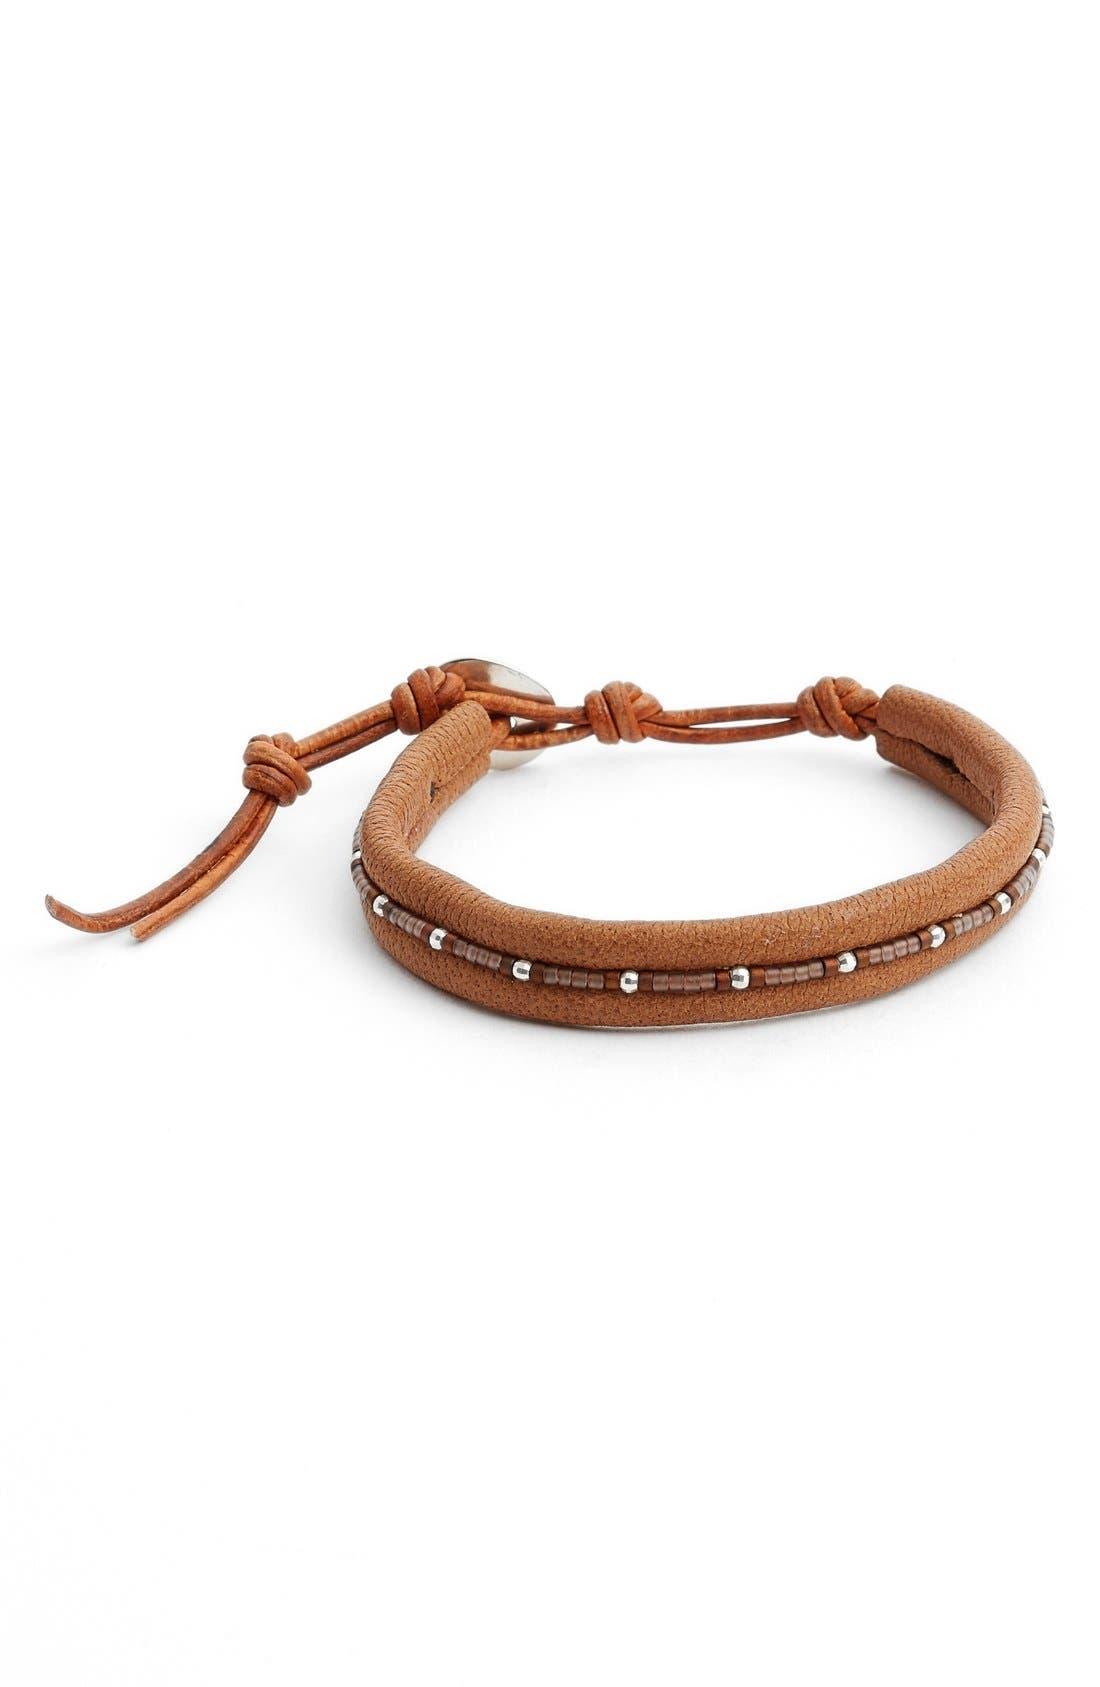 Main Image - Chan Luu Seed Beed Leather Bracelet